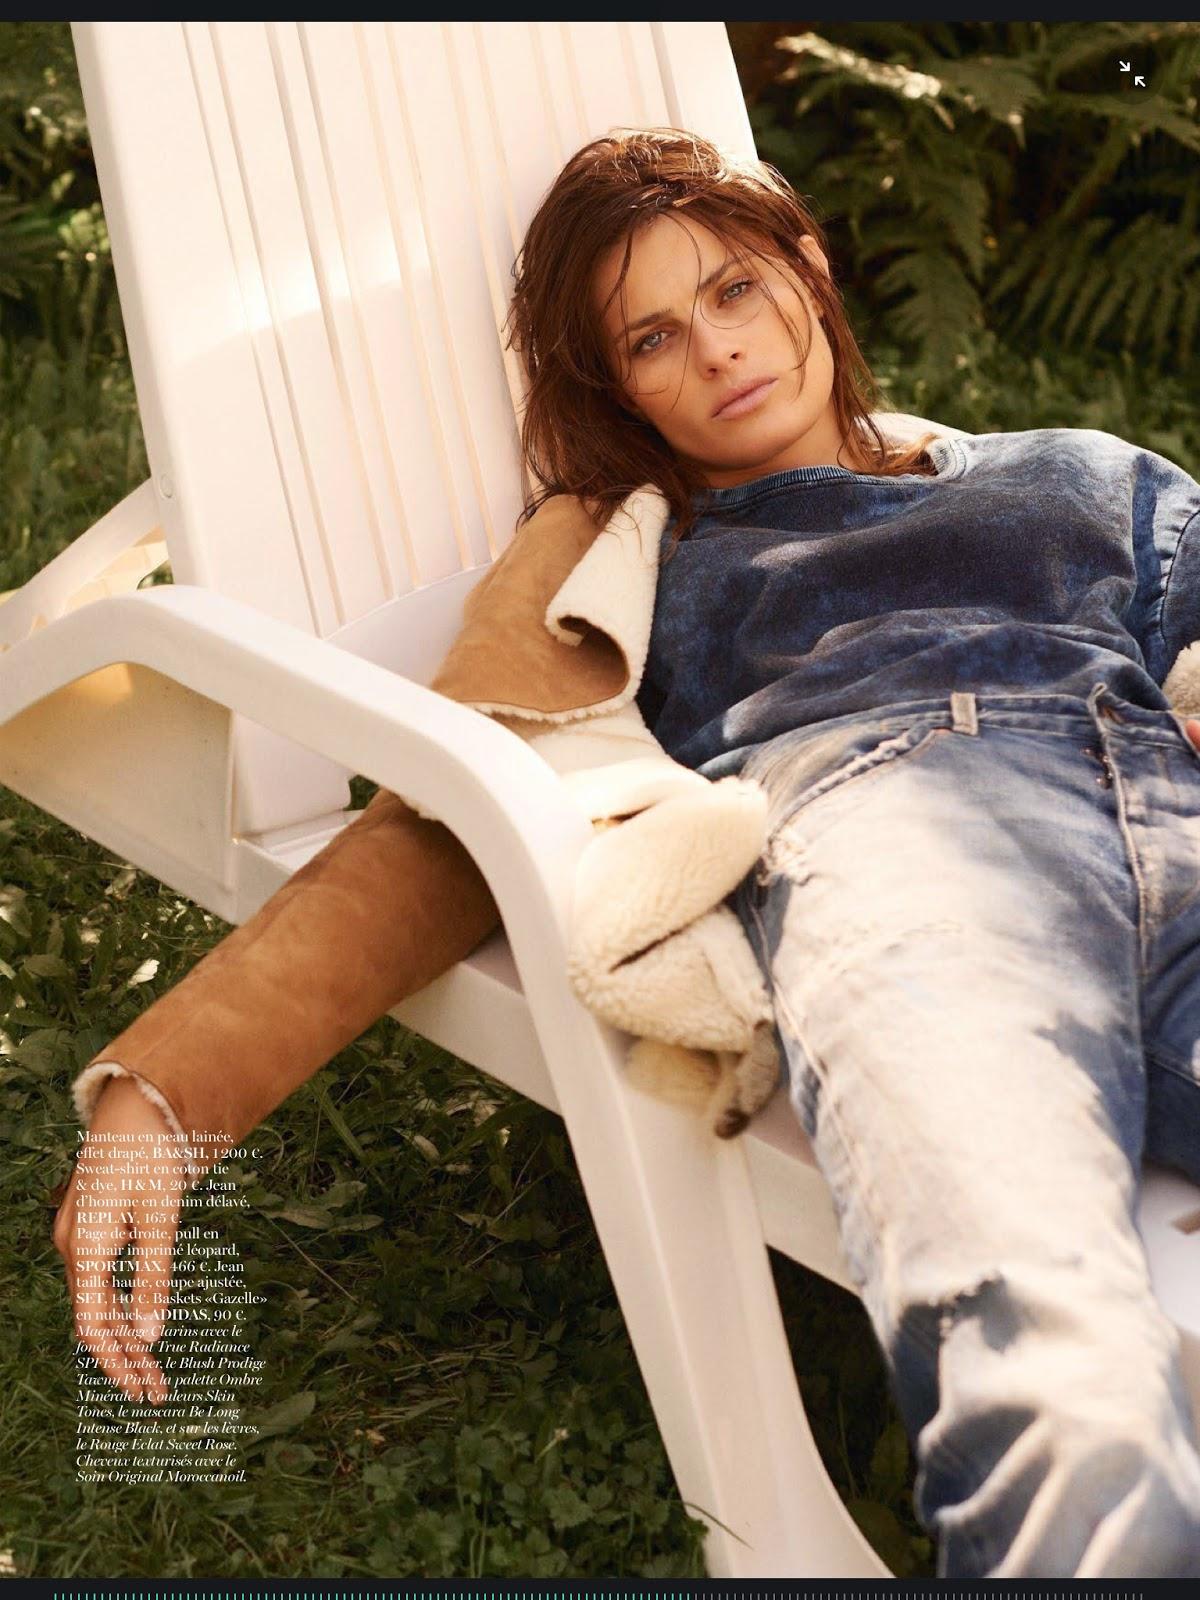 Clochet_Isabeli _Fontana _for _Vogue _Paris _November _2014_photography_by_Scott_Trindle_styling_Geraldine_Saglio_03